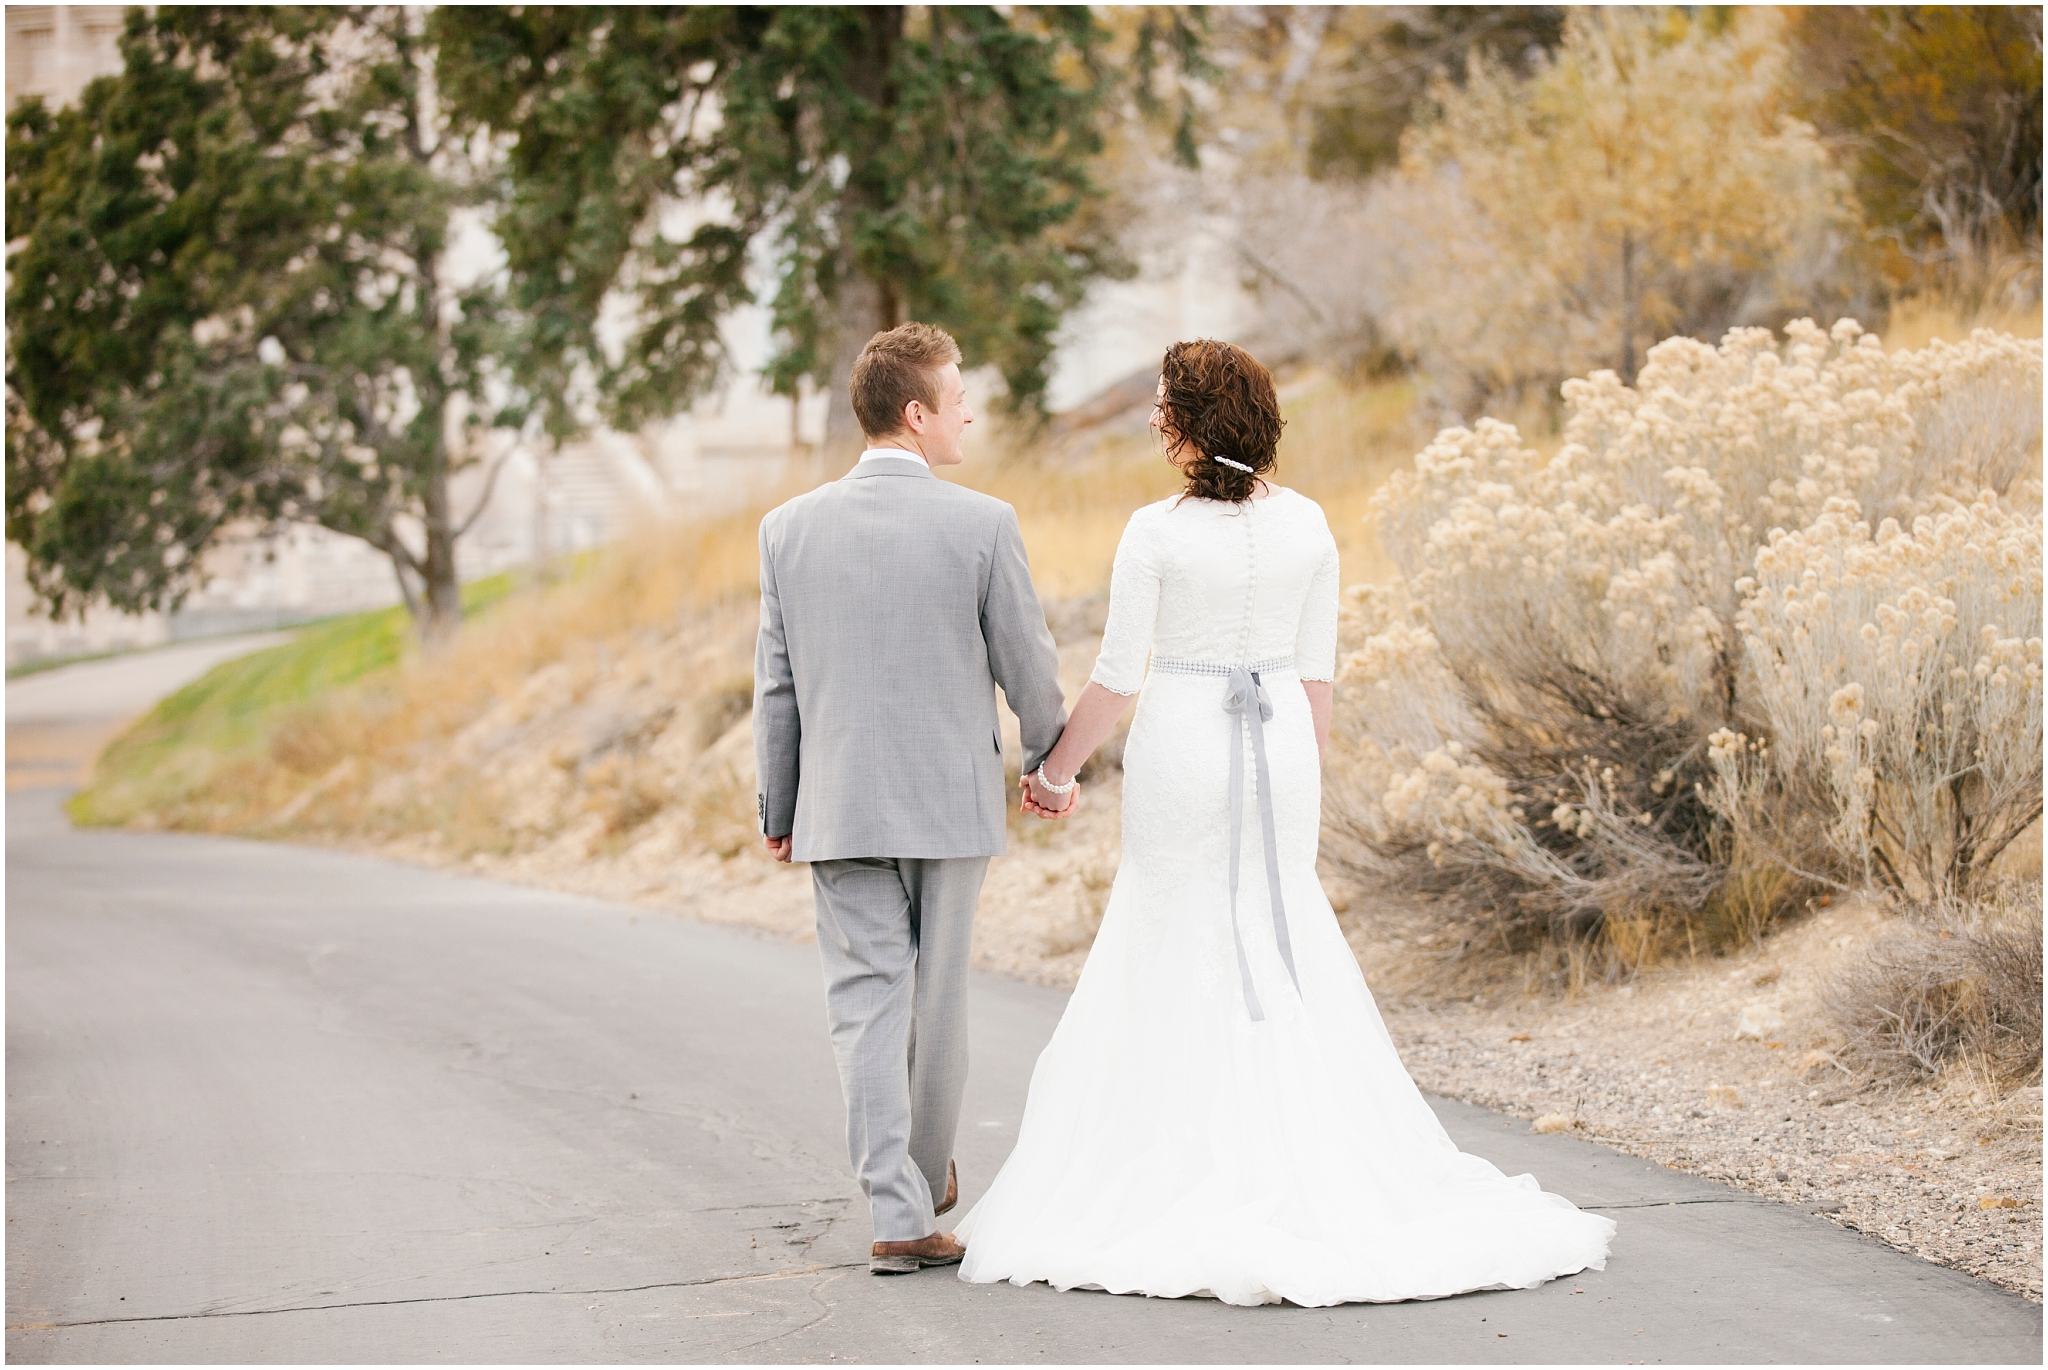 BA-Bridals-176_Lizzie-B-Imagery-Utah-Wedding-Photographer-Central-Utah-Photographer-Utah-County-Manti-Utah-Temple.jpg